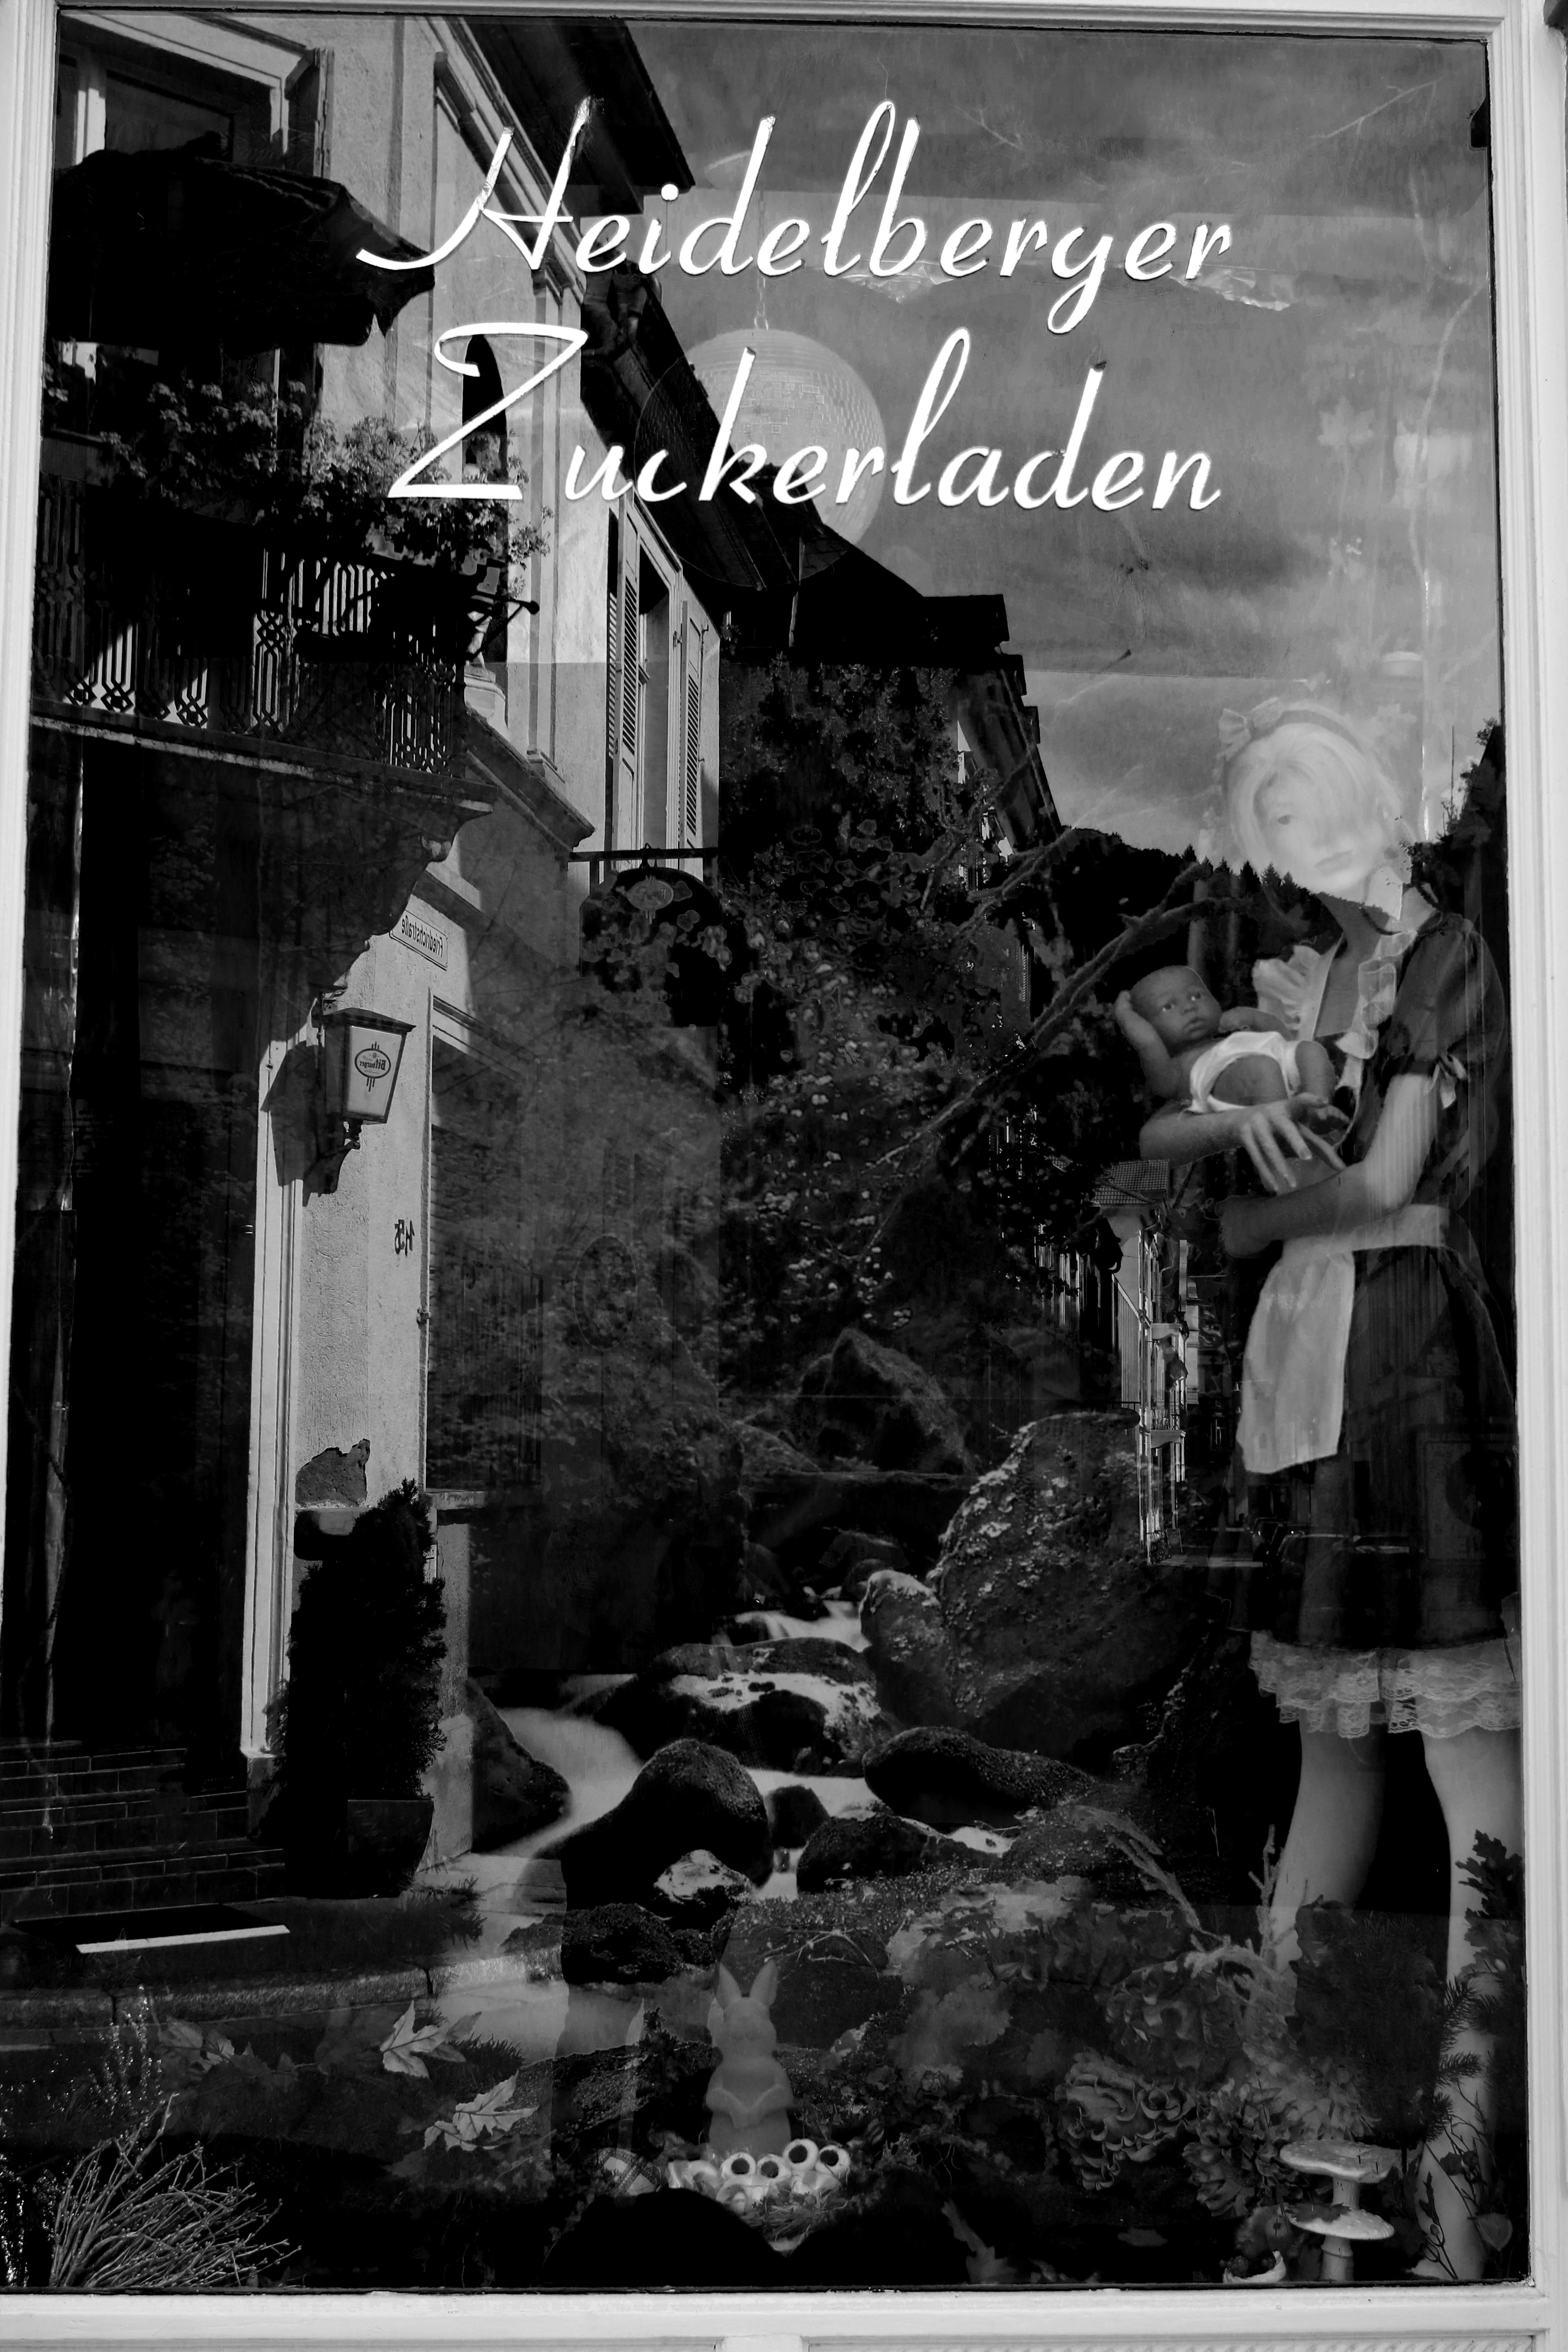 Fotografie Heidelberg kostenlose foto schwarz und weiß weiß fotografie heidelberg